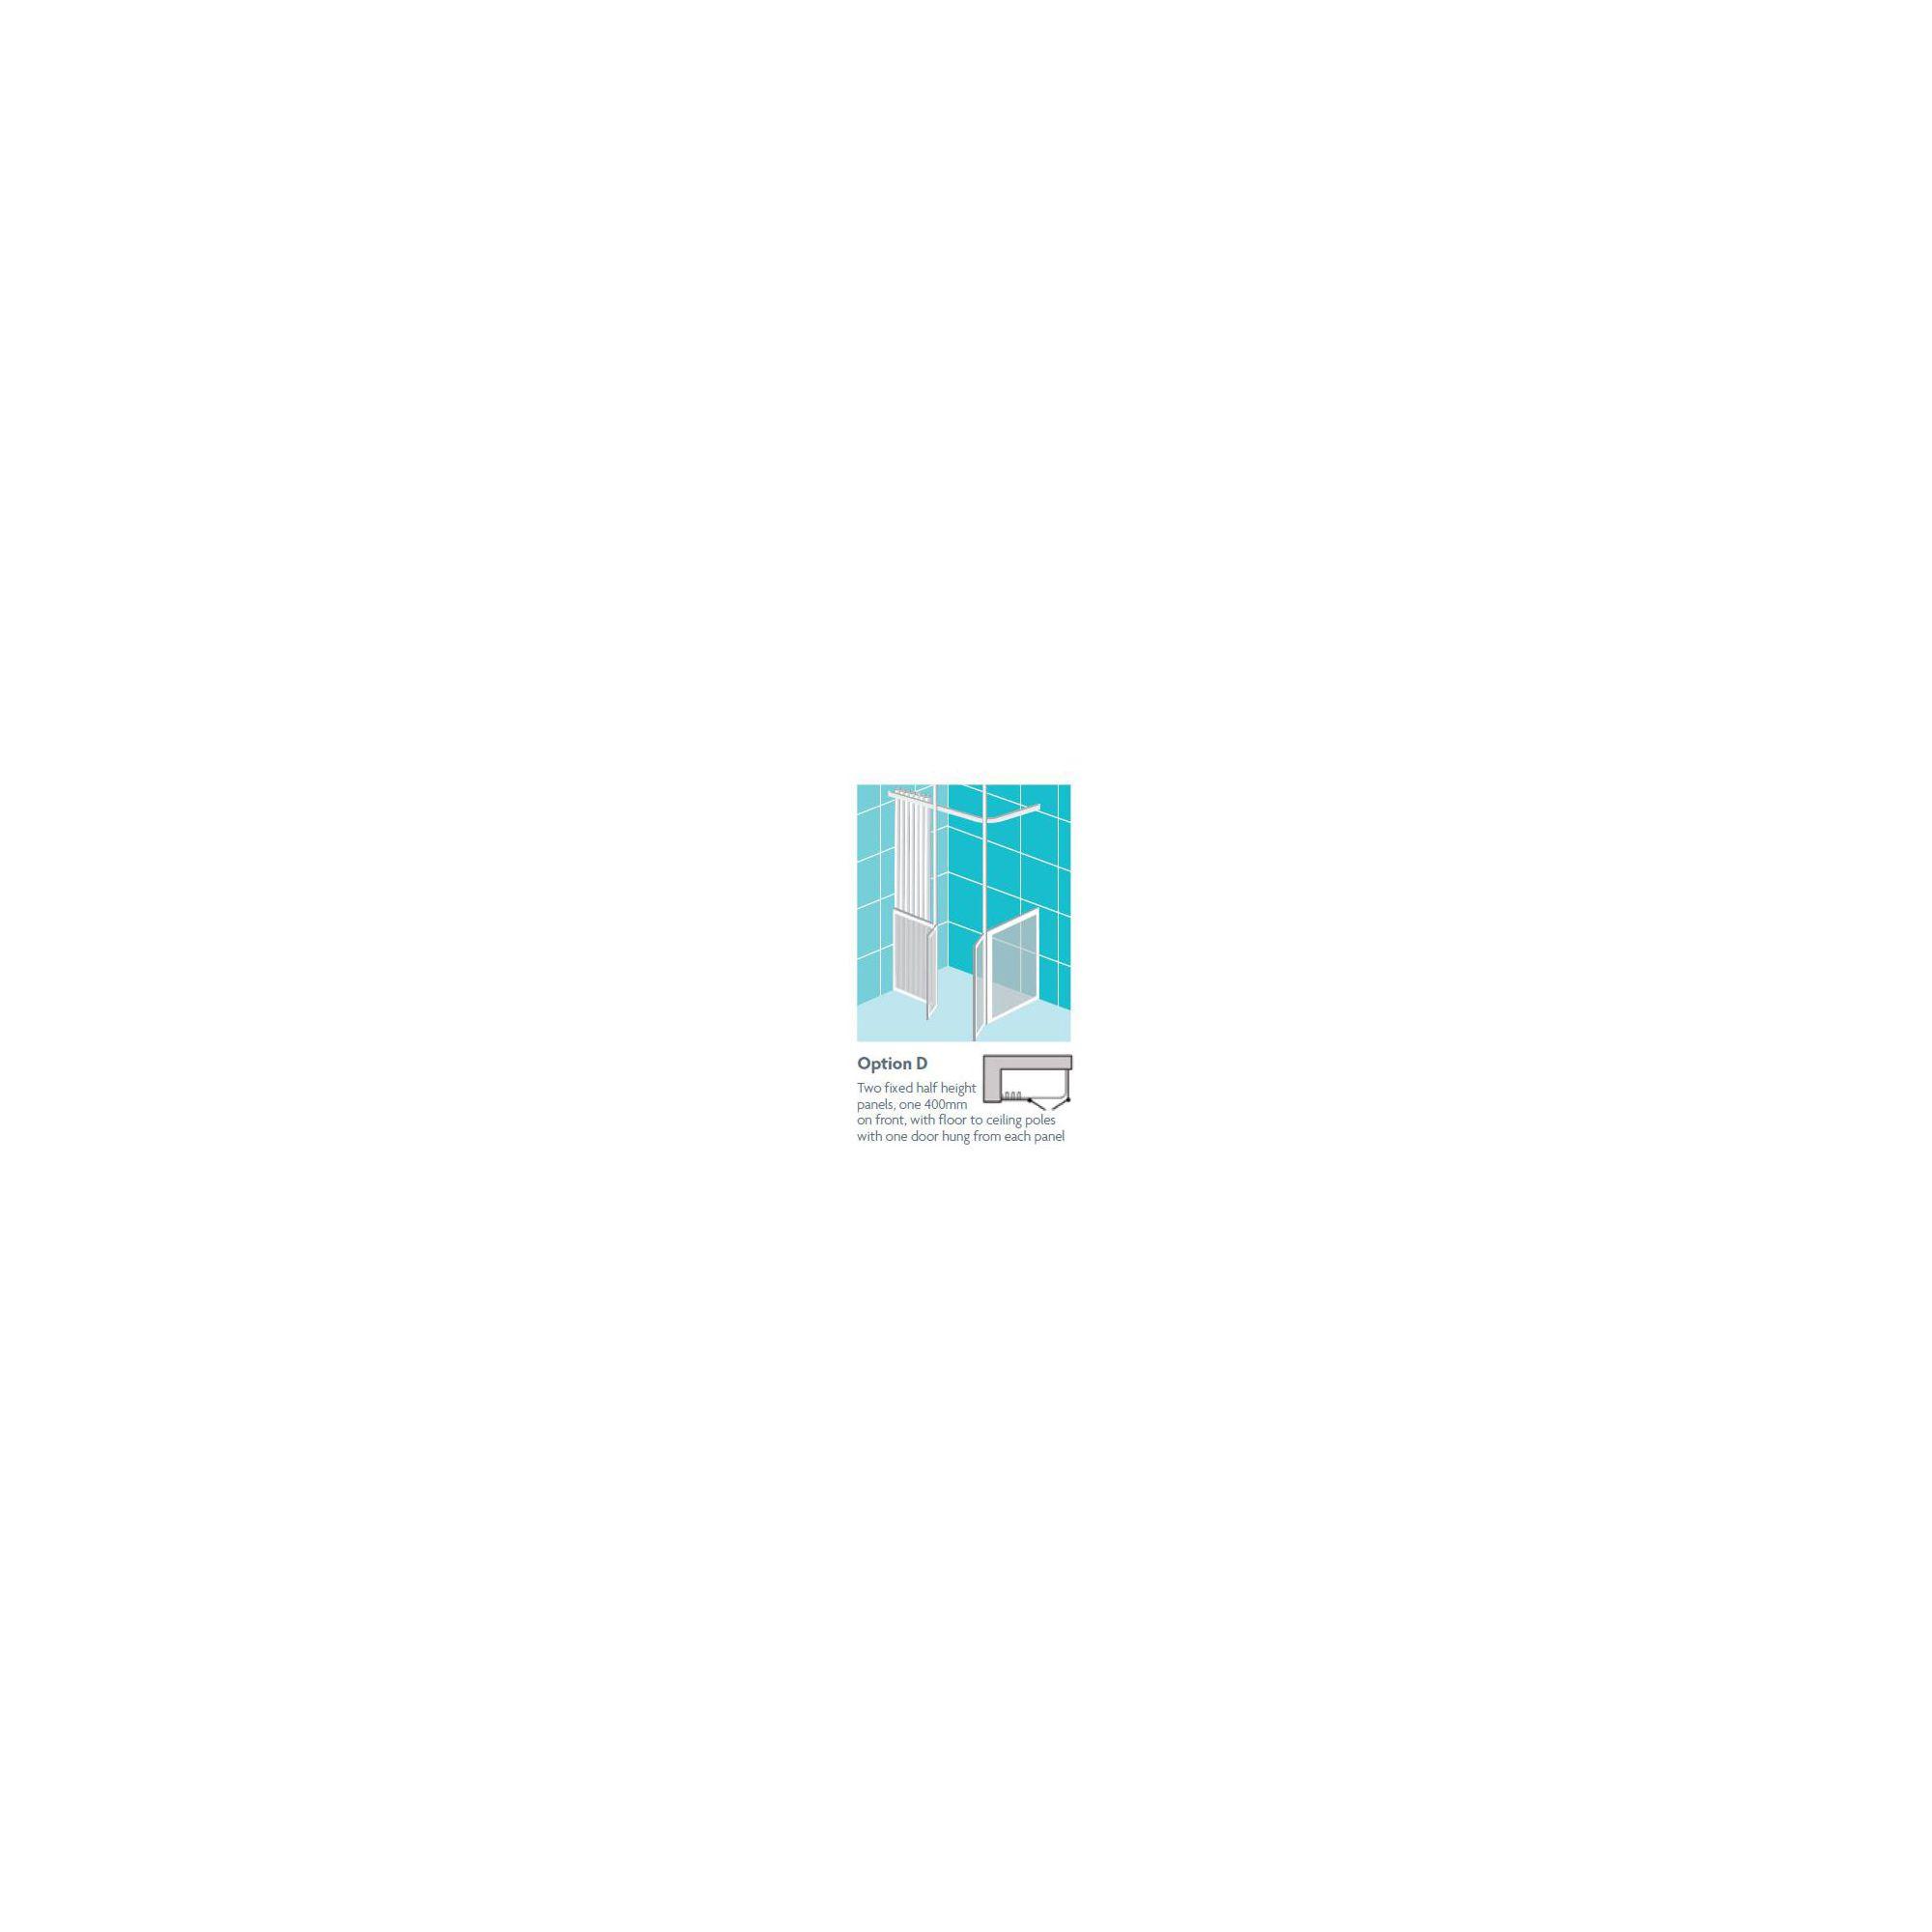 Impey Supreme Corner Door Option D Left Hand 1300mm x 800mm at Tesco Direct